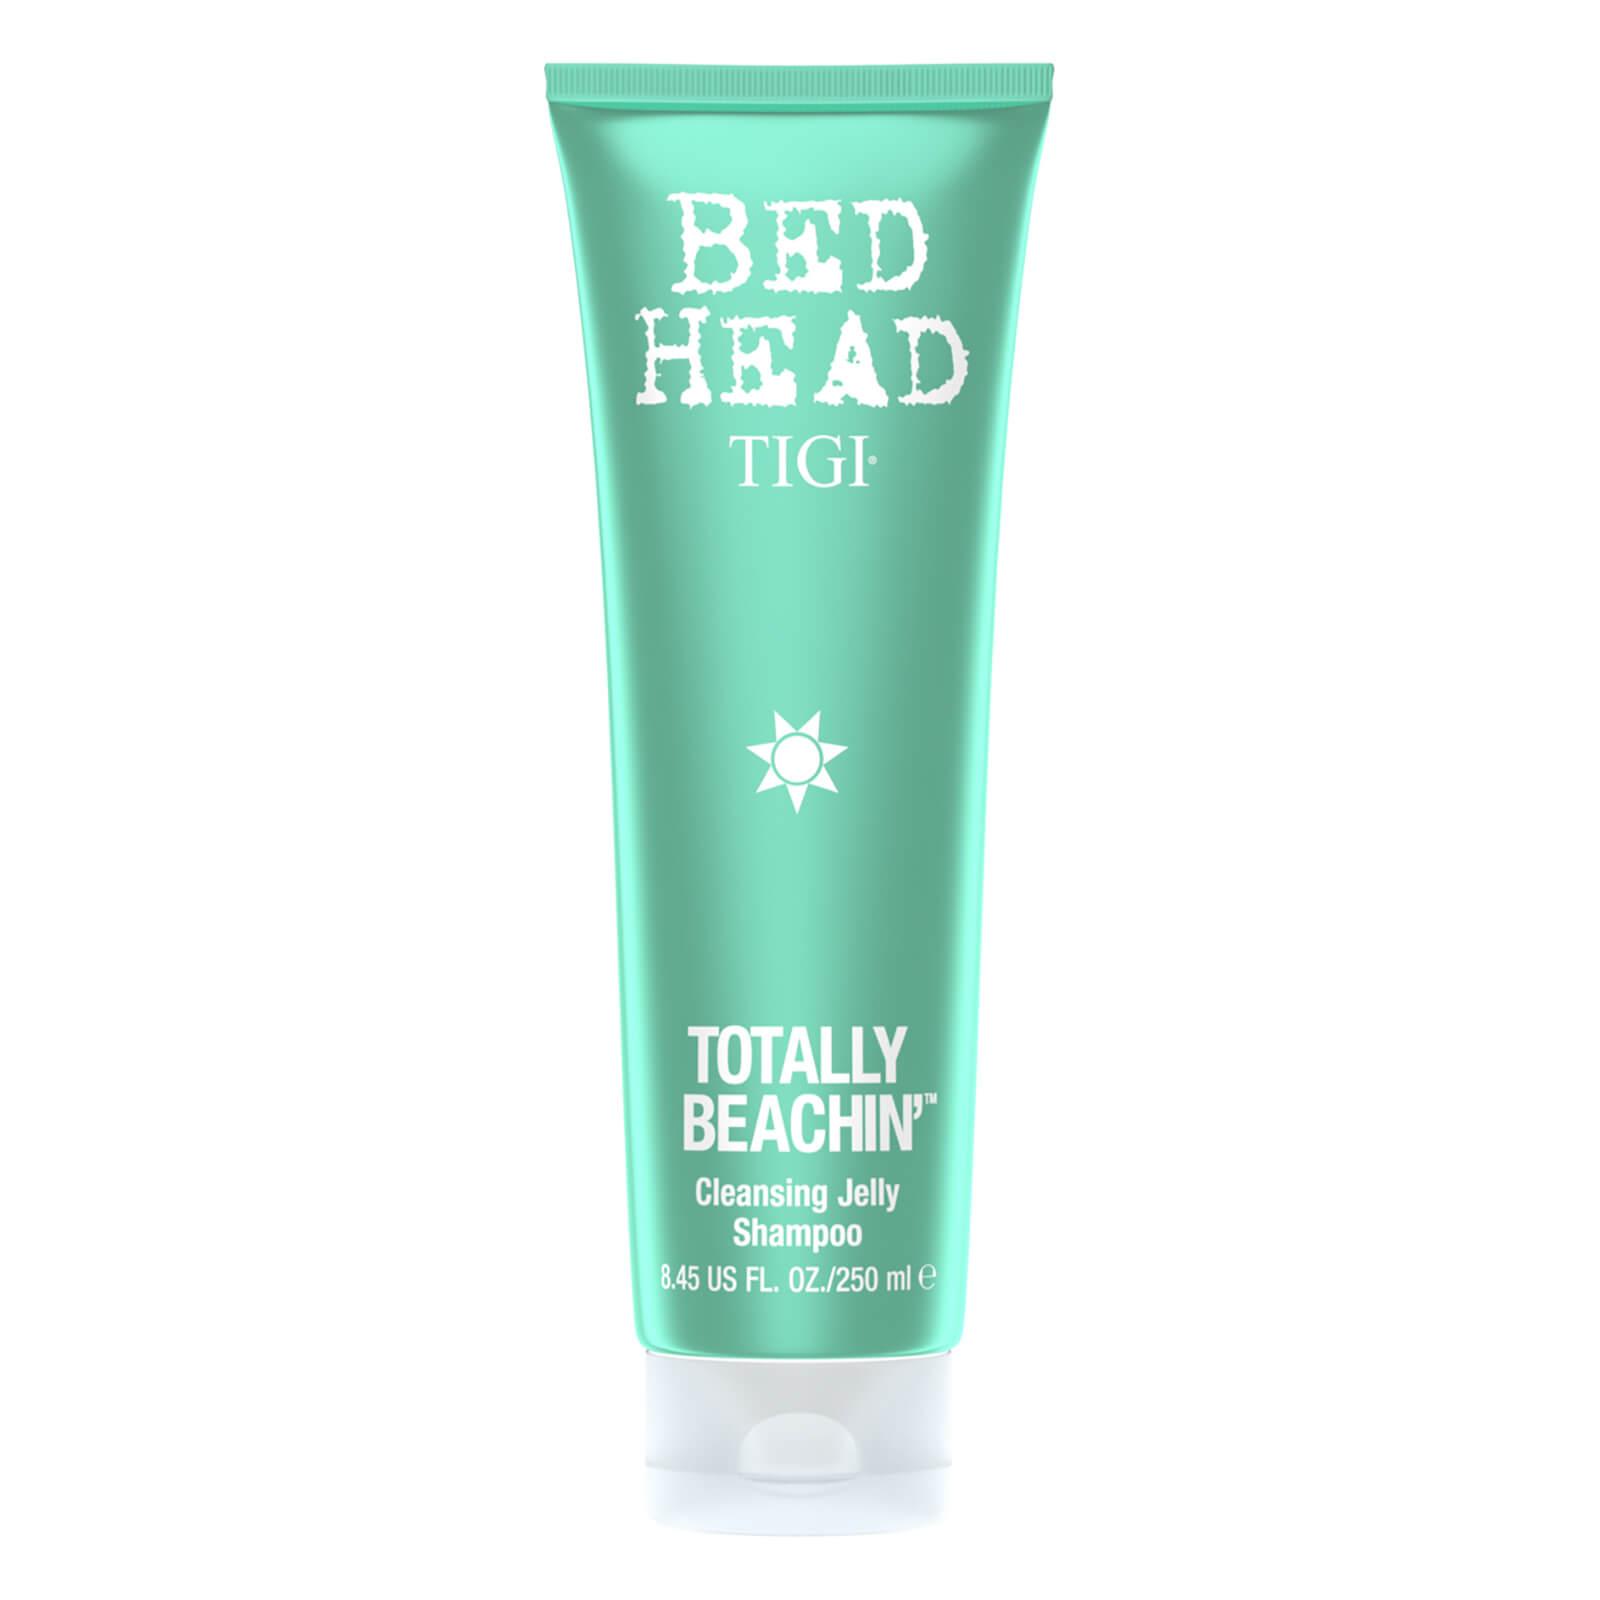 Bed Head Tigi Totally Beachin Shampoo - šampon s ochranou před sluncem, 250 ml